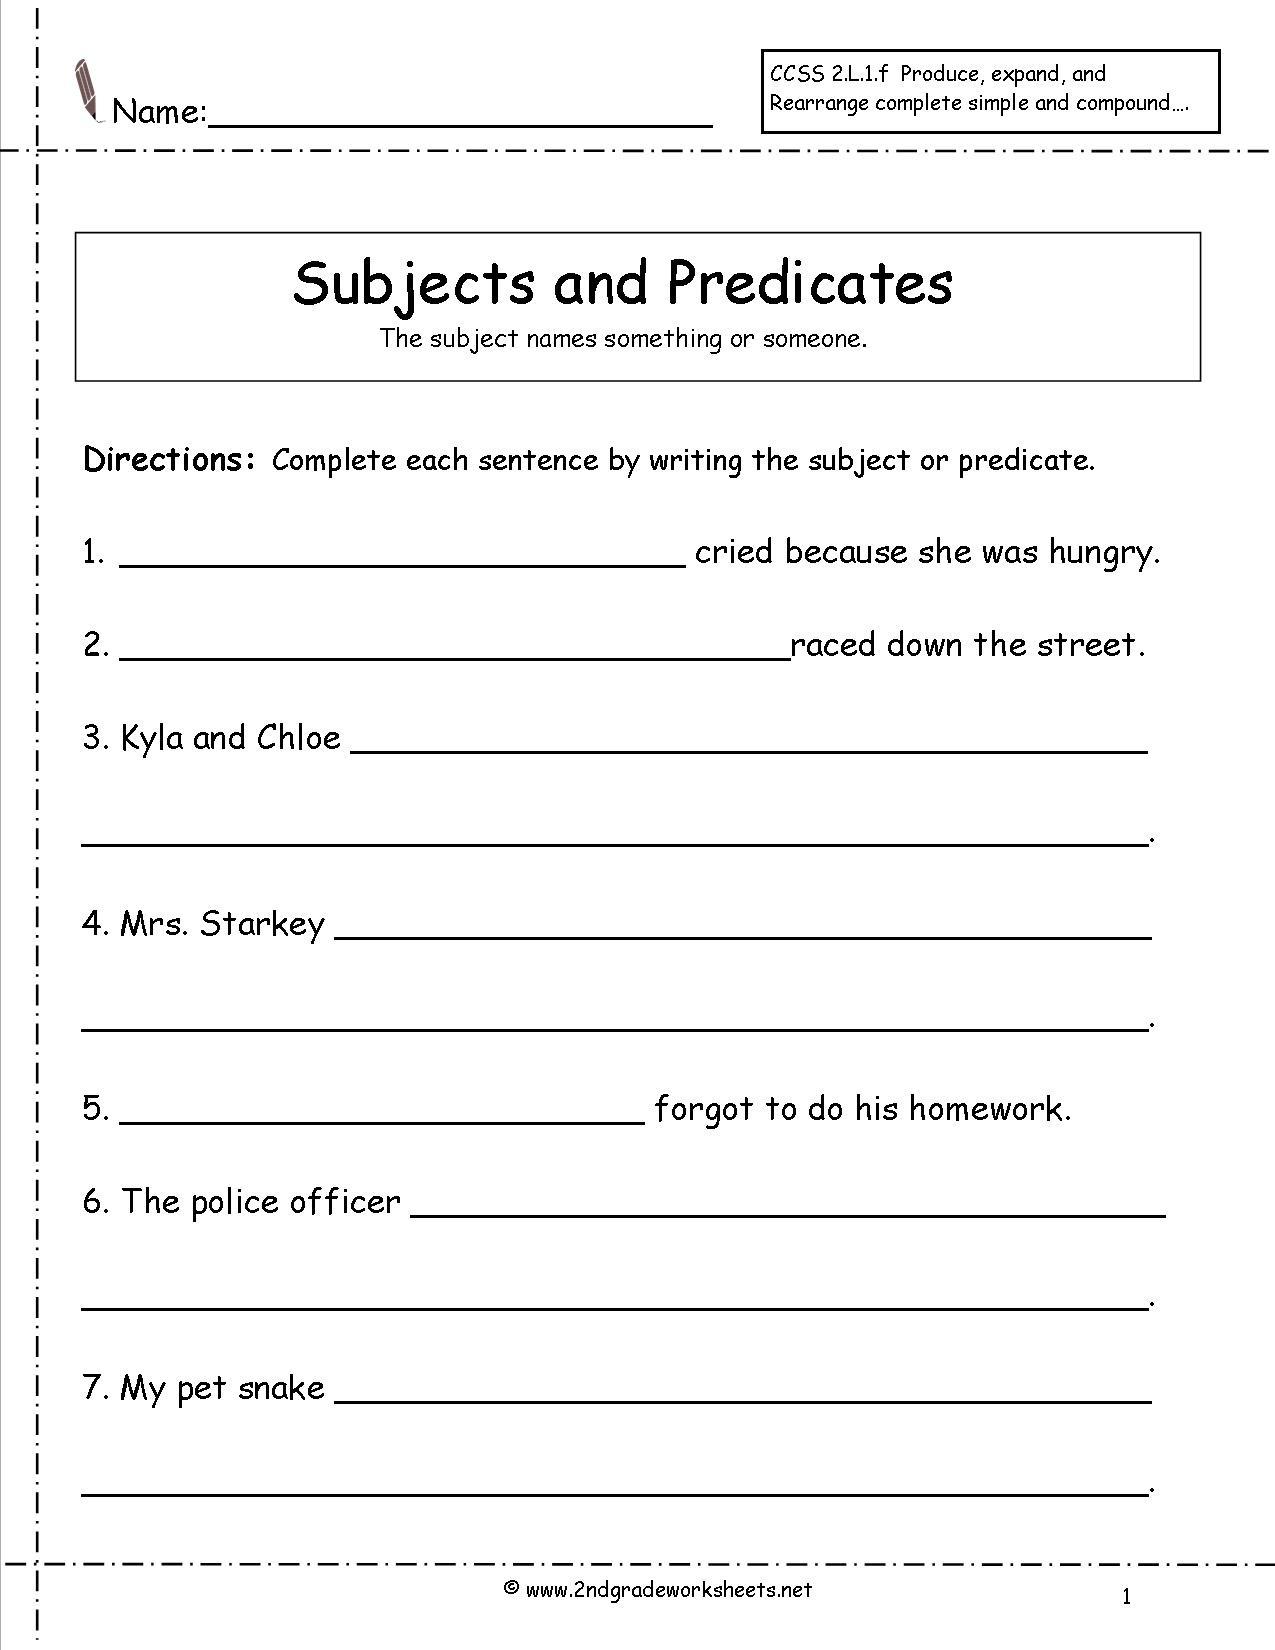 Second Grade Sentences Worksheets, Ccss 2.l.1.f Worksheets. - Free Printable Subject Predicate Worksheets 2Nd Grade